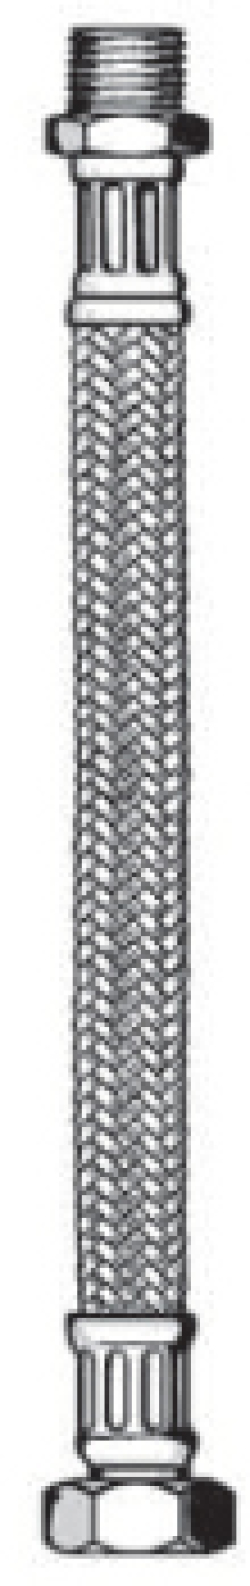 МЕ 5615.1204.50 Meiflex Dn13, 1/2 BPx1/2 BP, 500mm